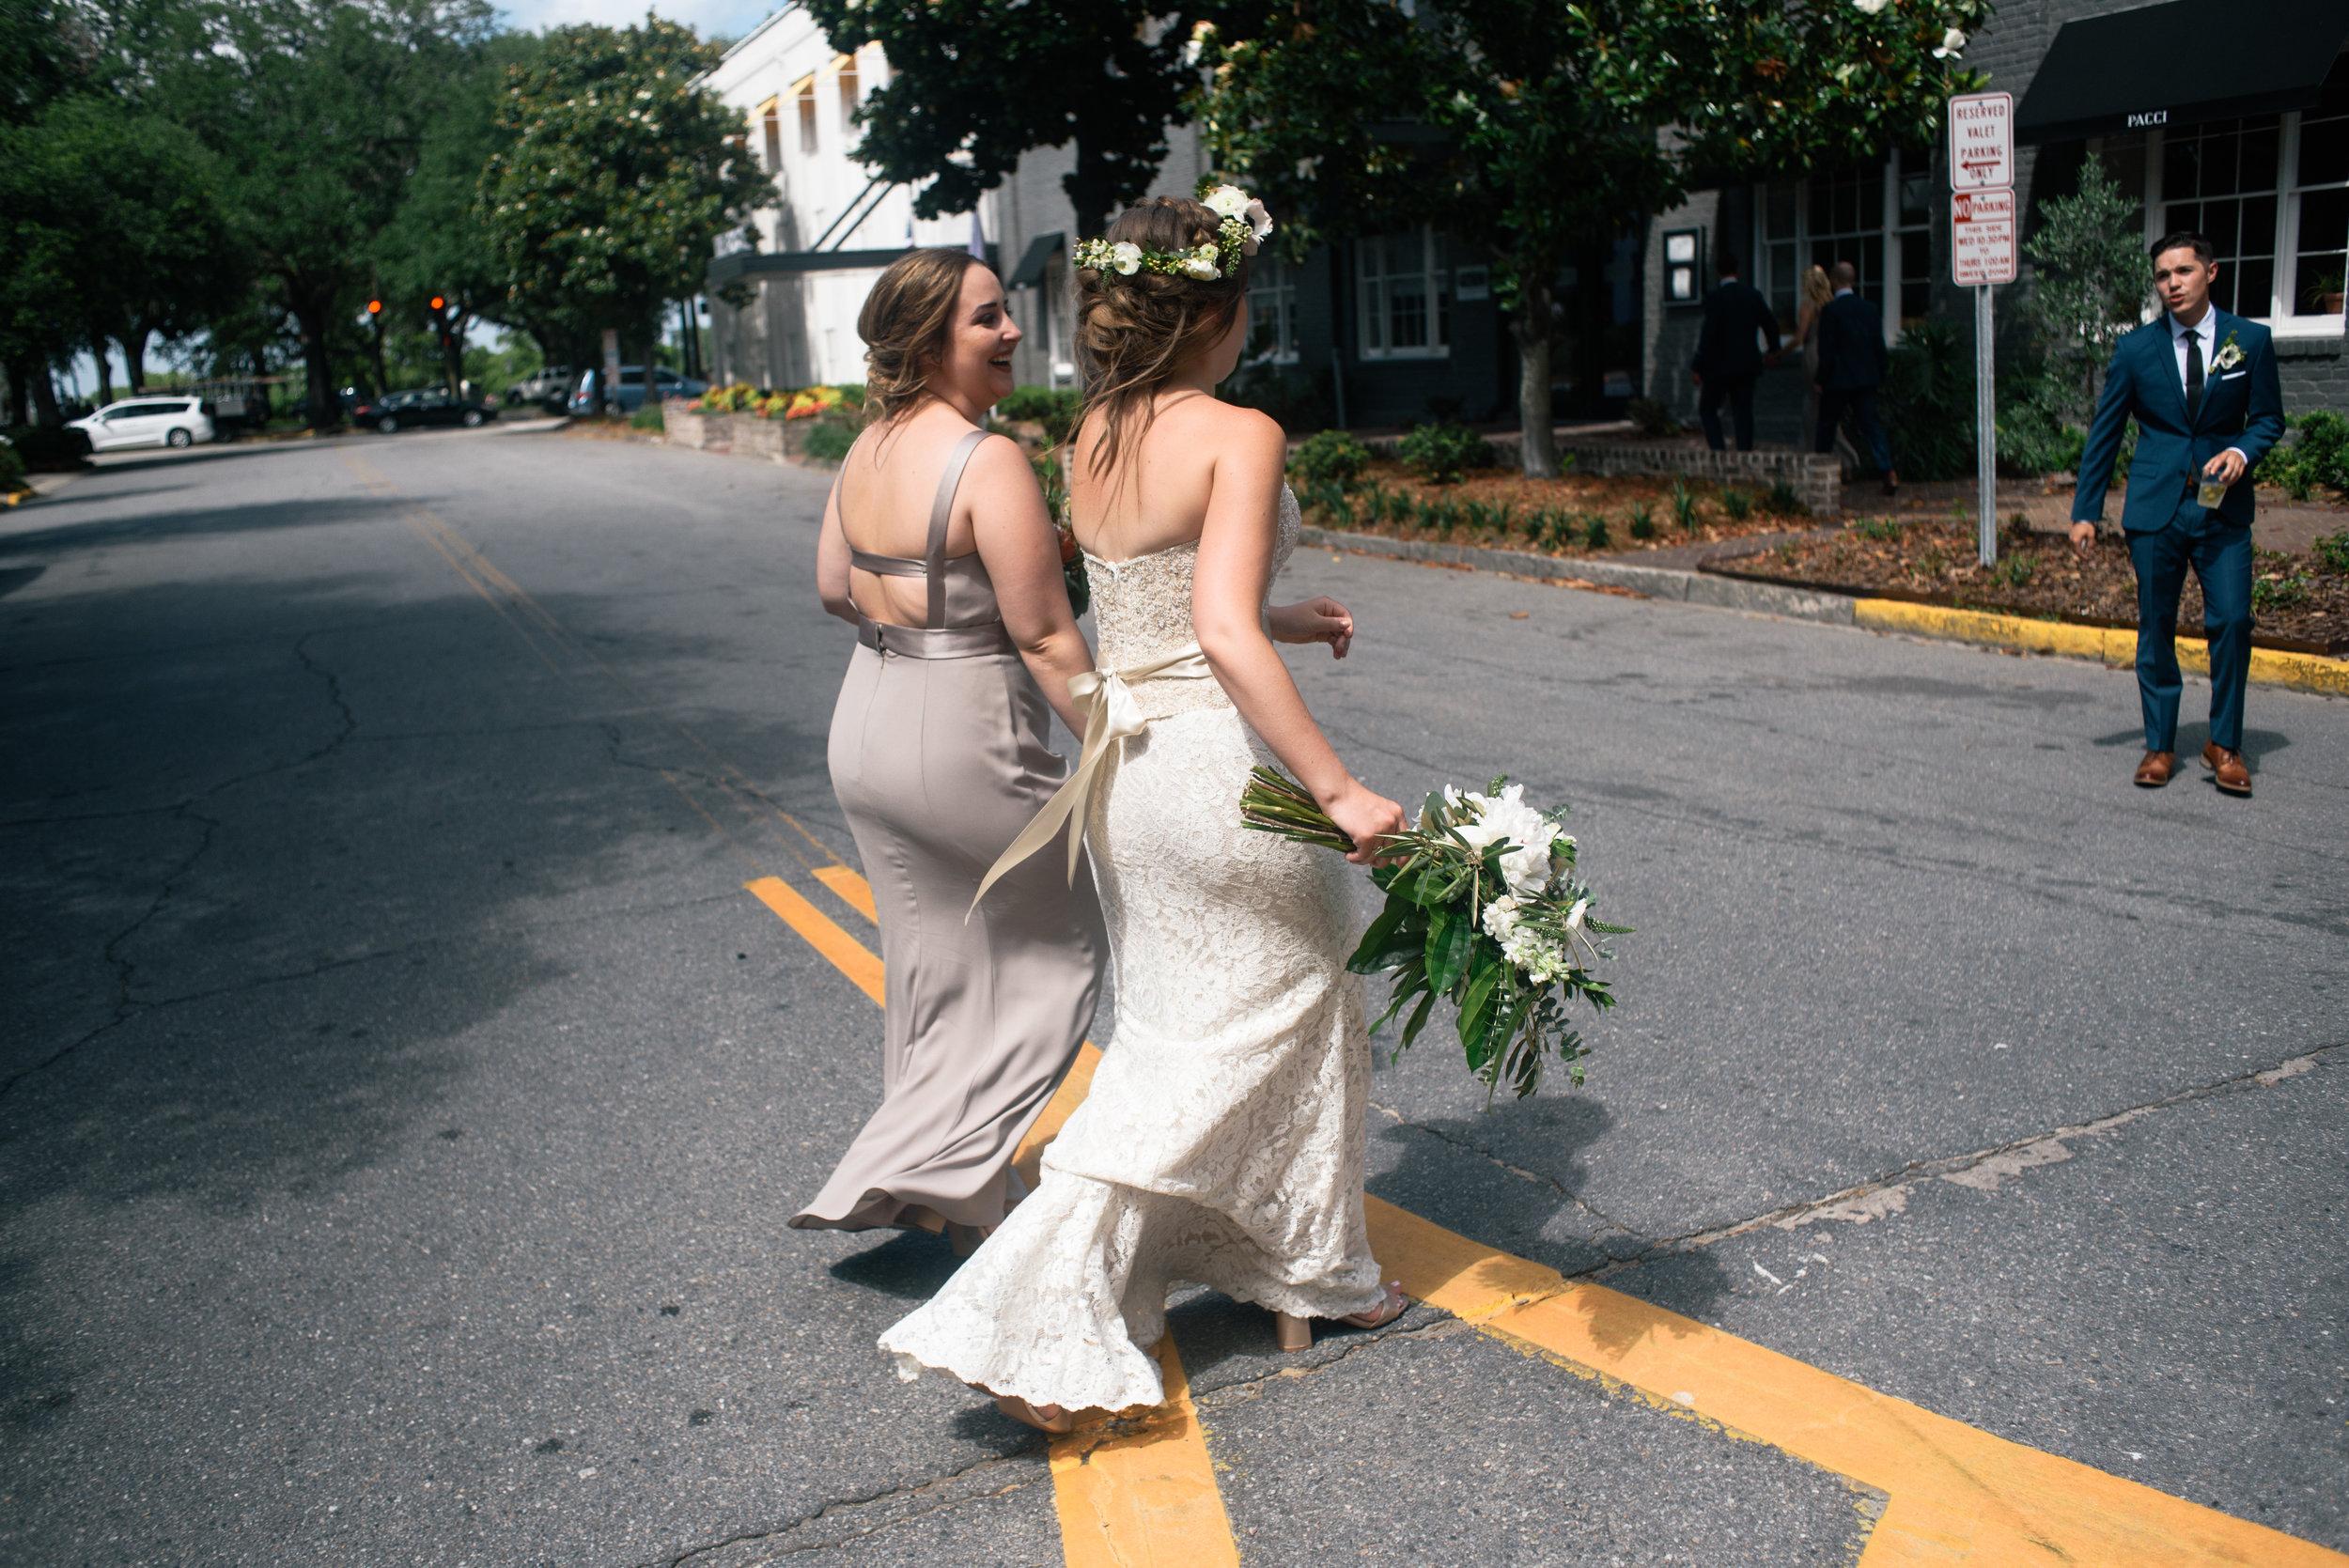 savannah-station-elopement-photographer-savannah-elopement-photography-savannah-georgia-elopement-photographer-savannah-wedding-photographer-meg-hill-photo-jade-hill- (45 of 93).jpg